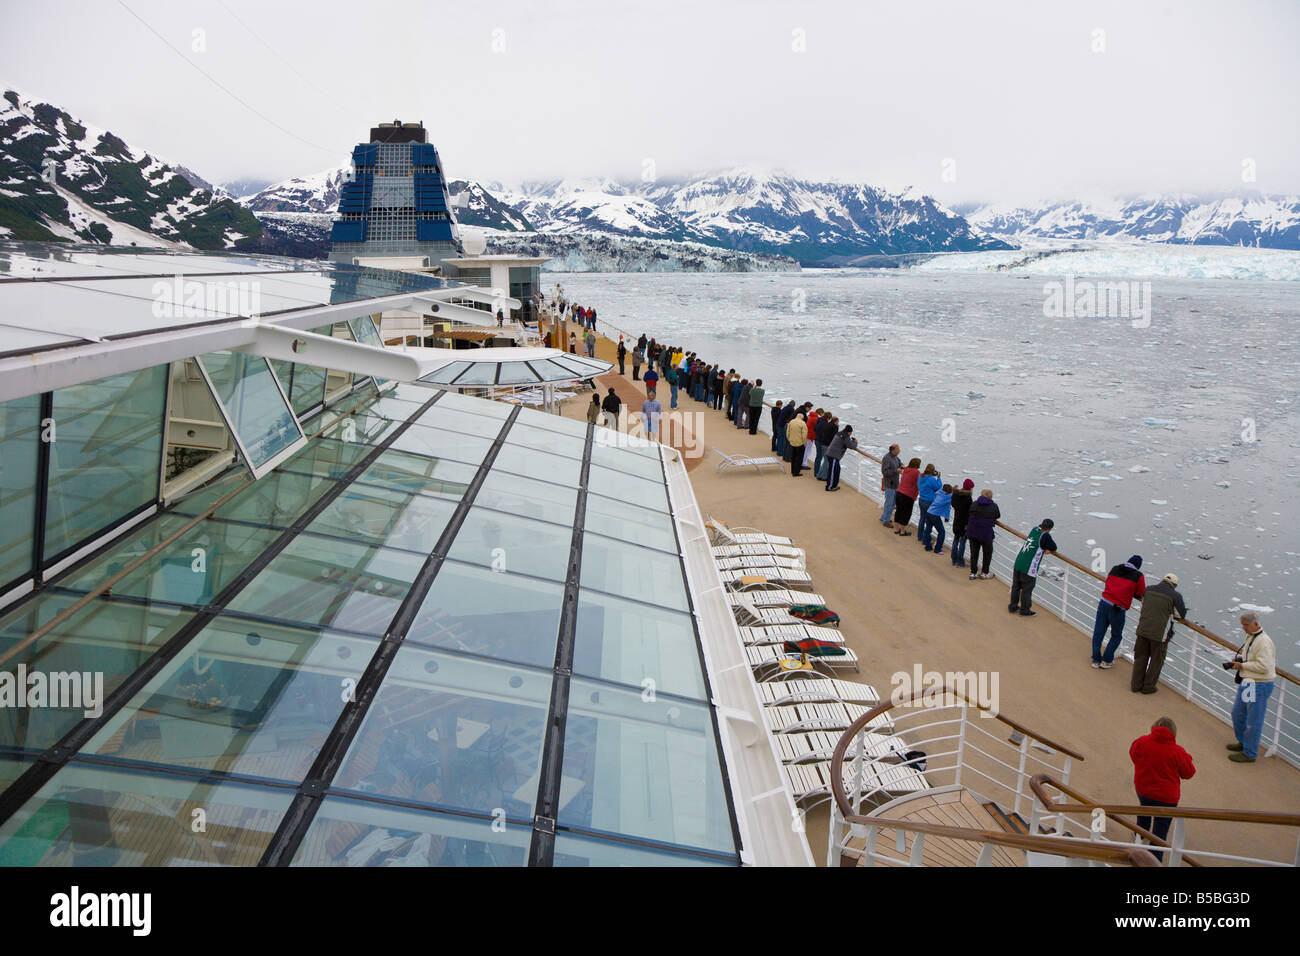 Cruise ship passengers line deck railing to see Hubbard Glacier in Disenchantment Bay and Yakutat Bay in Alaska - Stock Image